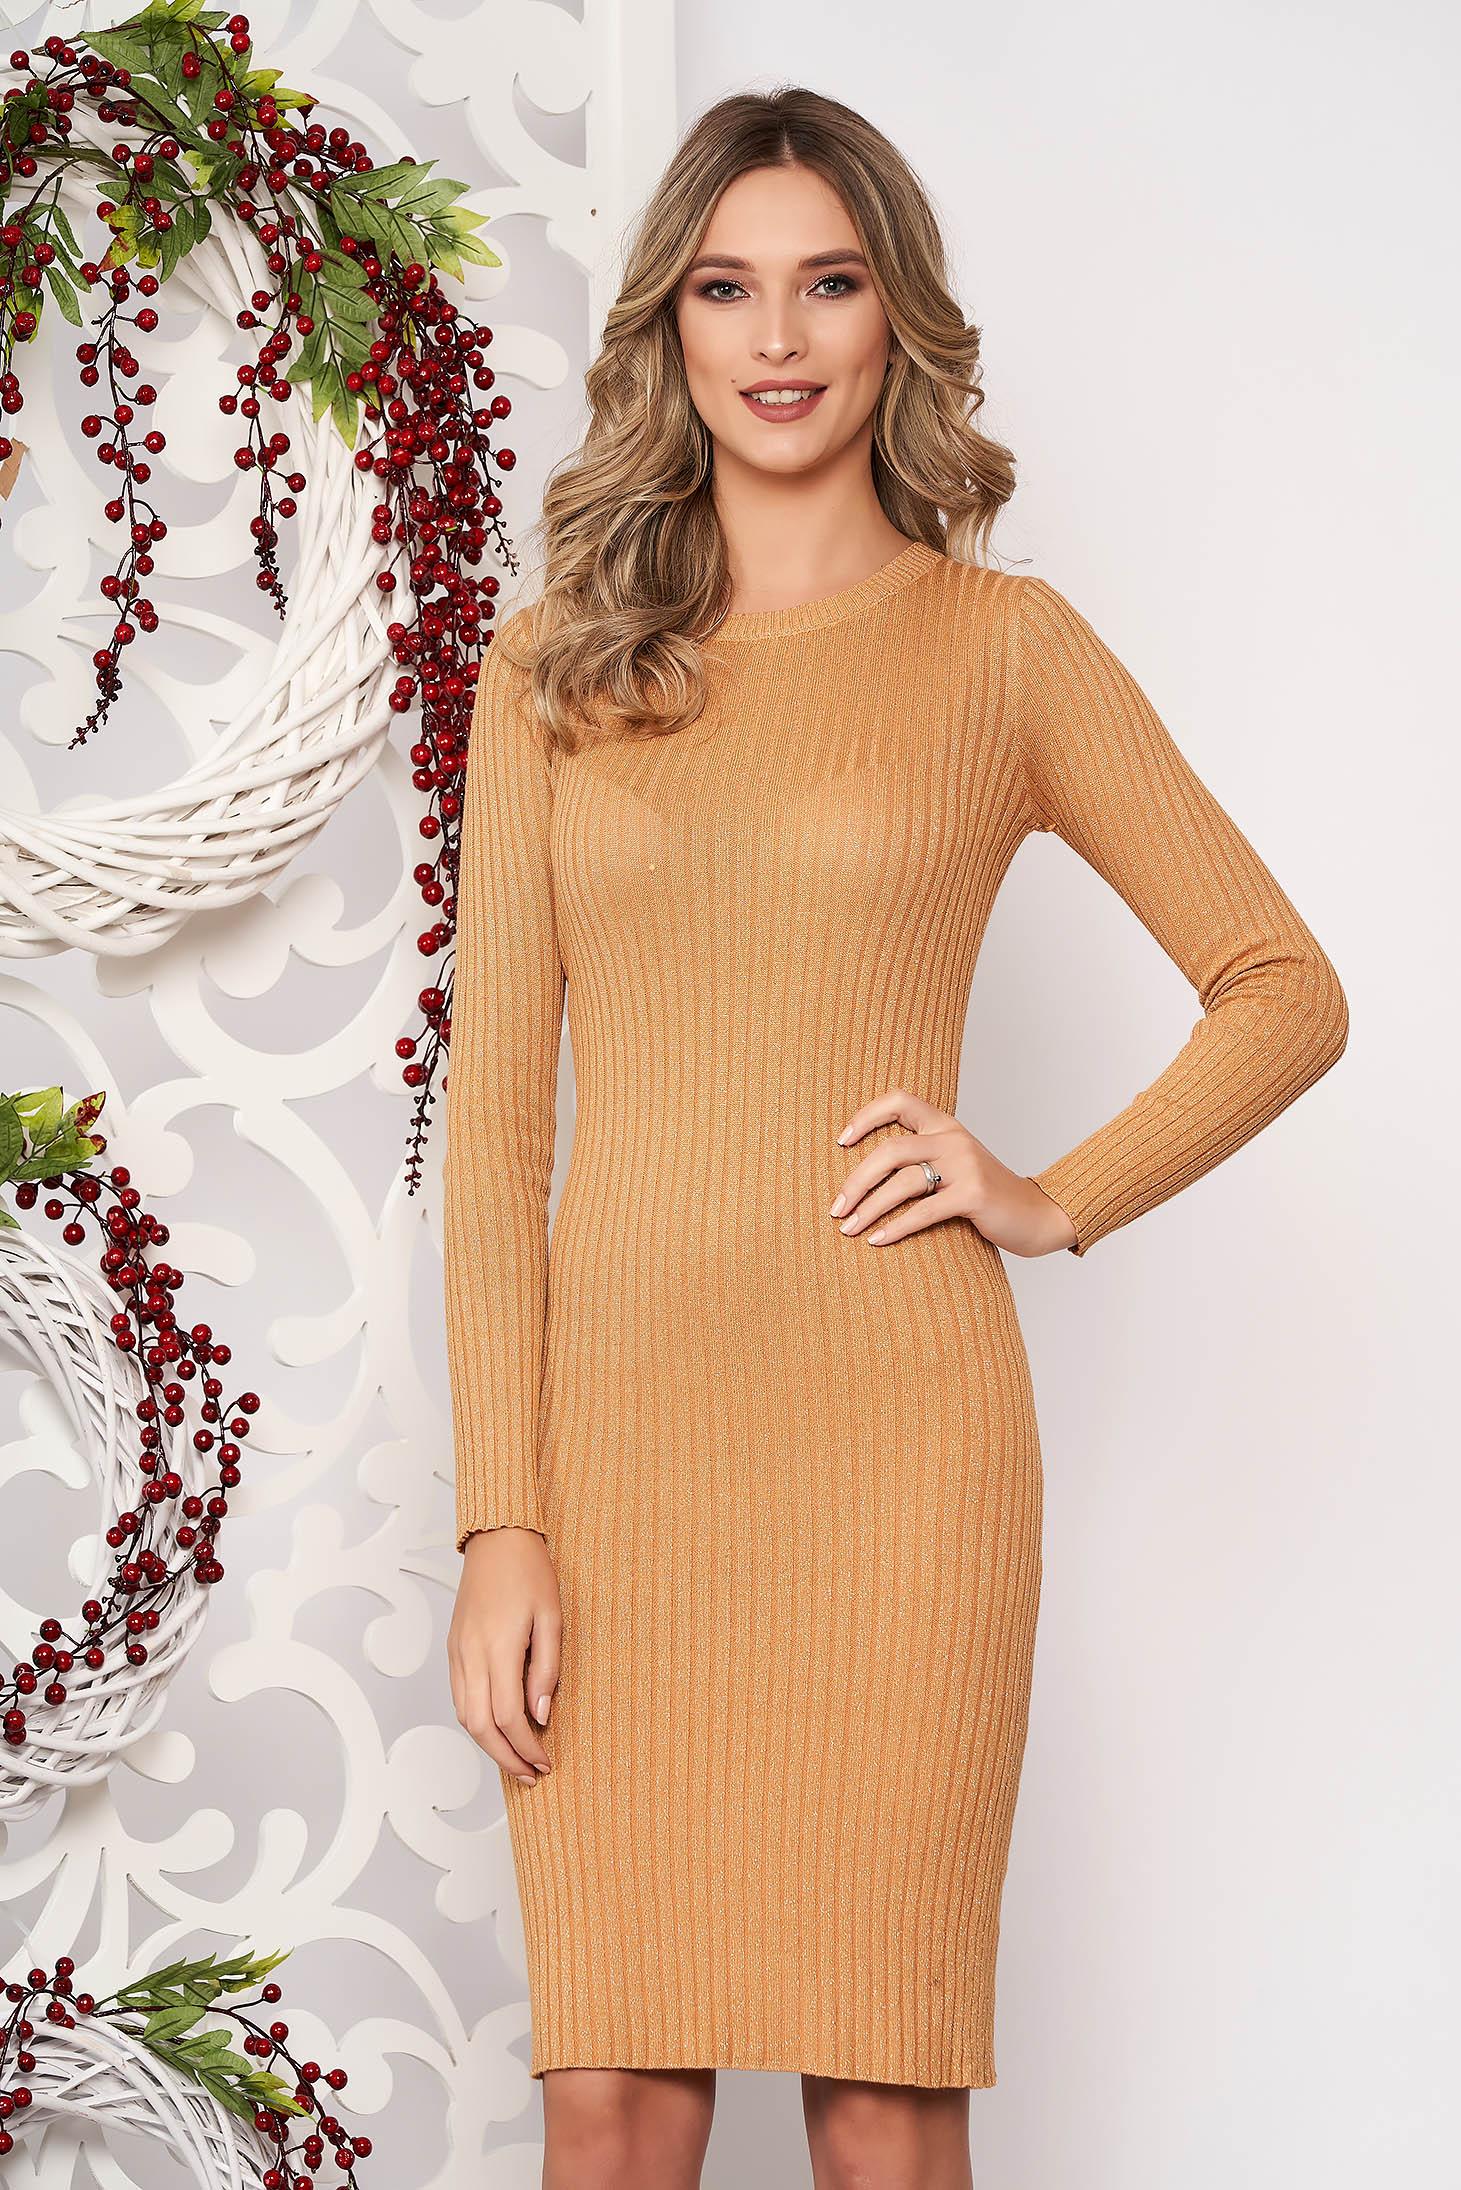 Dress mustard long sleeved slightly elastic cotton pencil midi